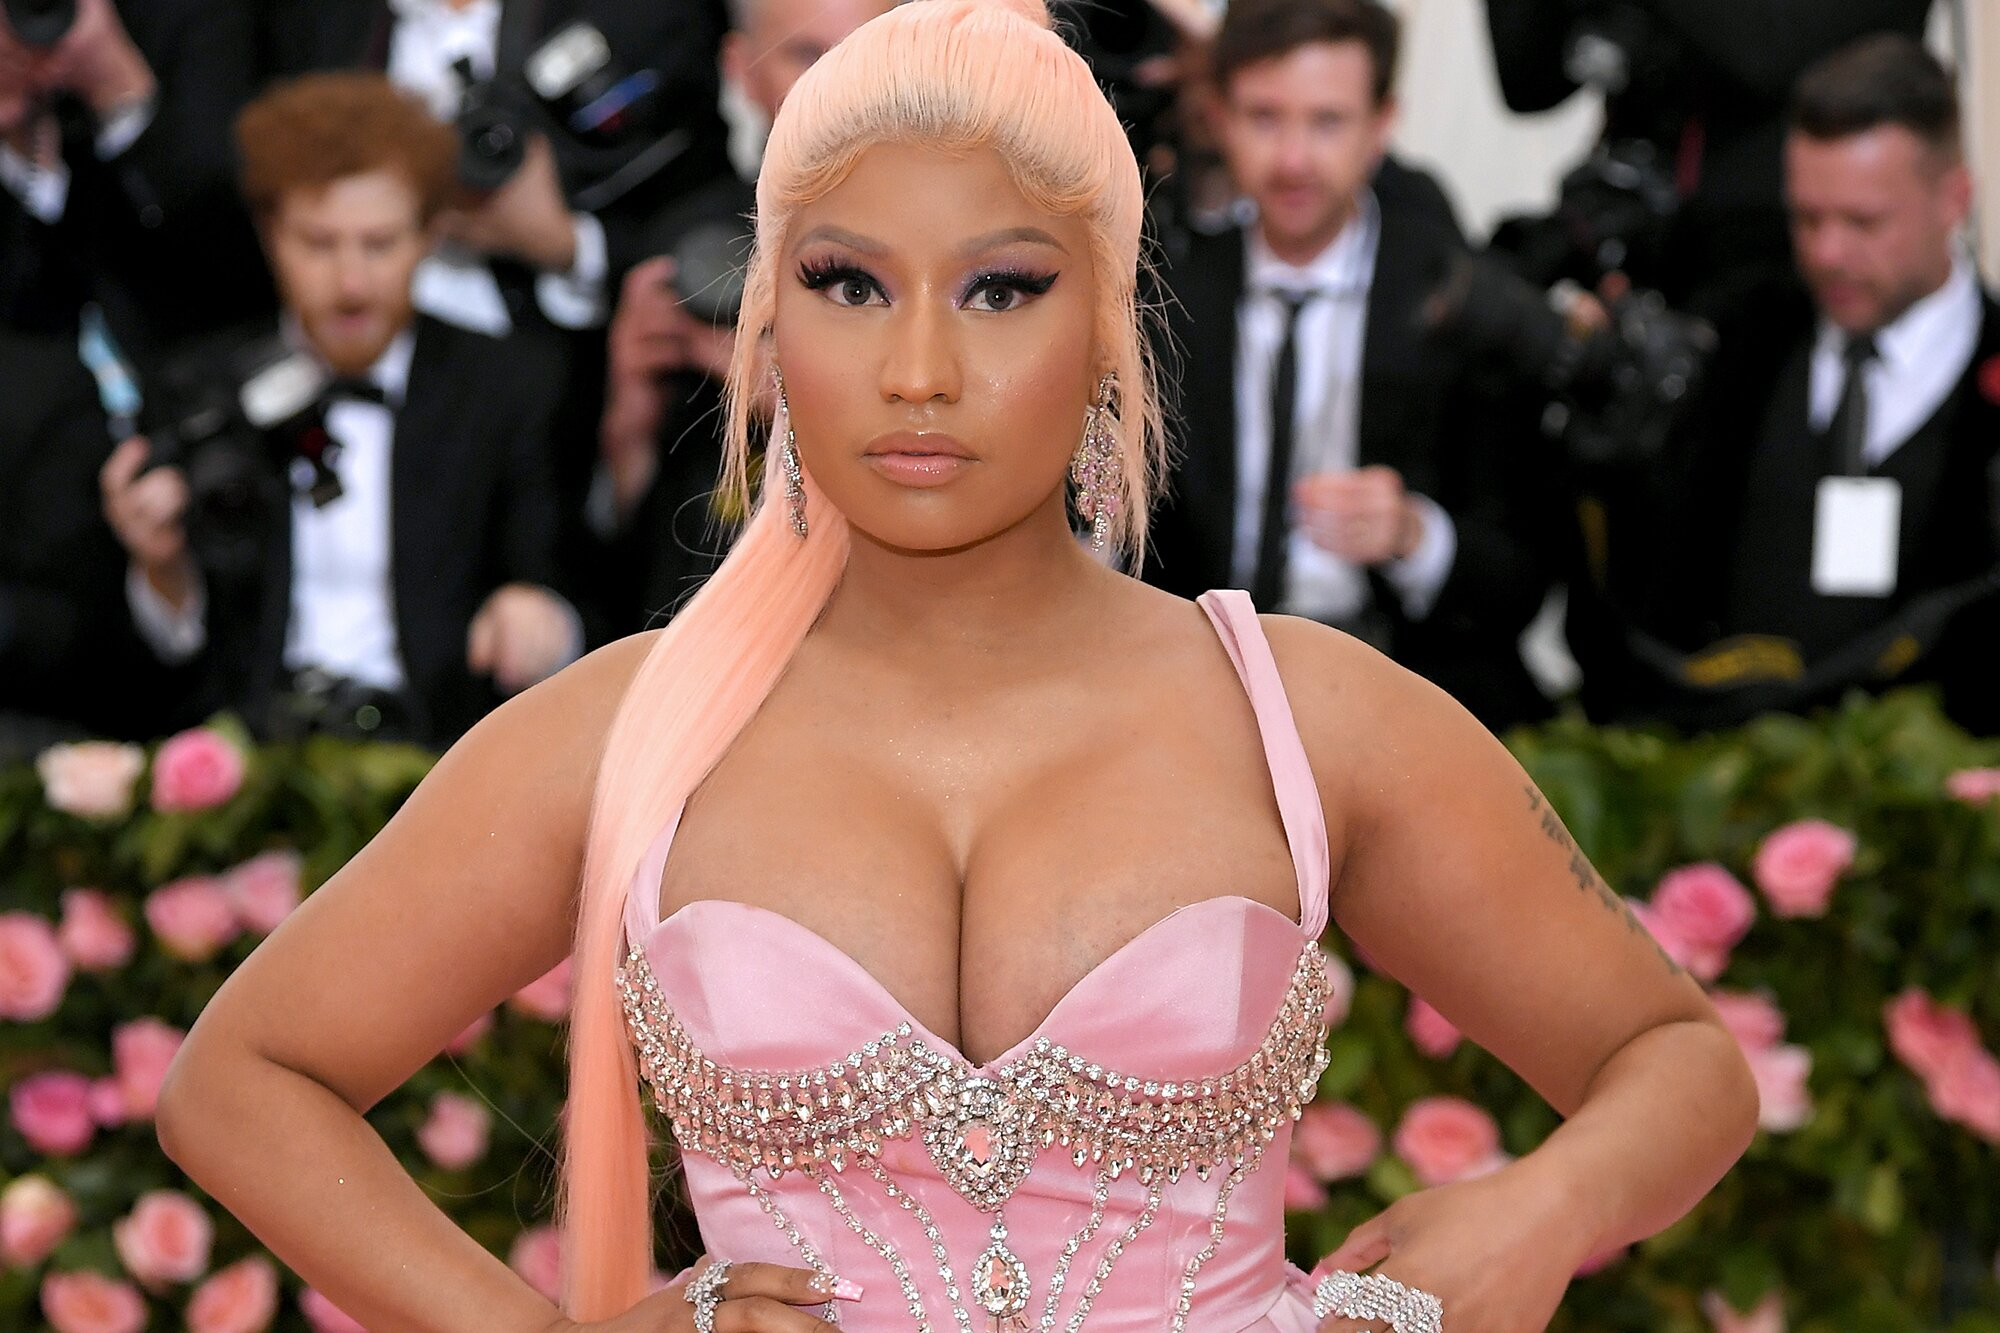 Nicki Minaj's father dies following hit-and-run accident | EW.com